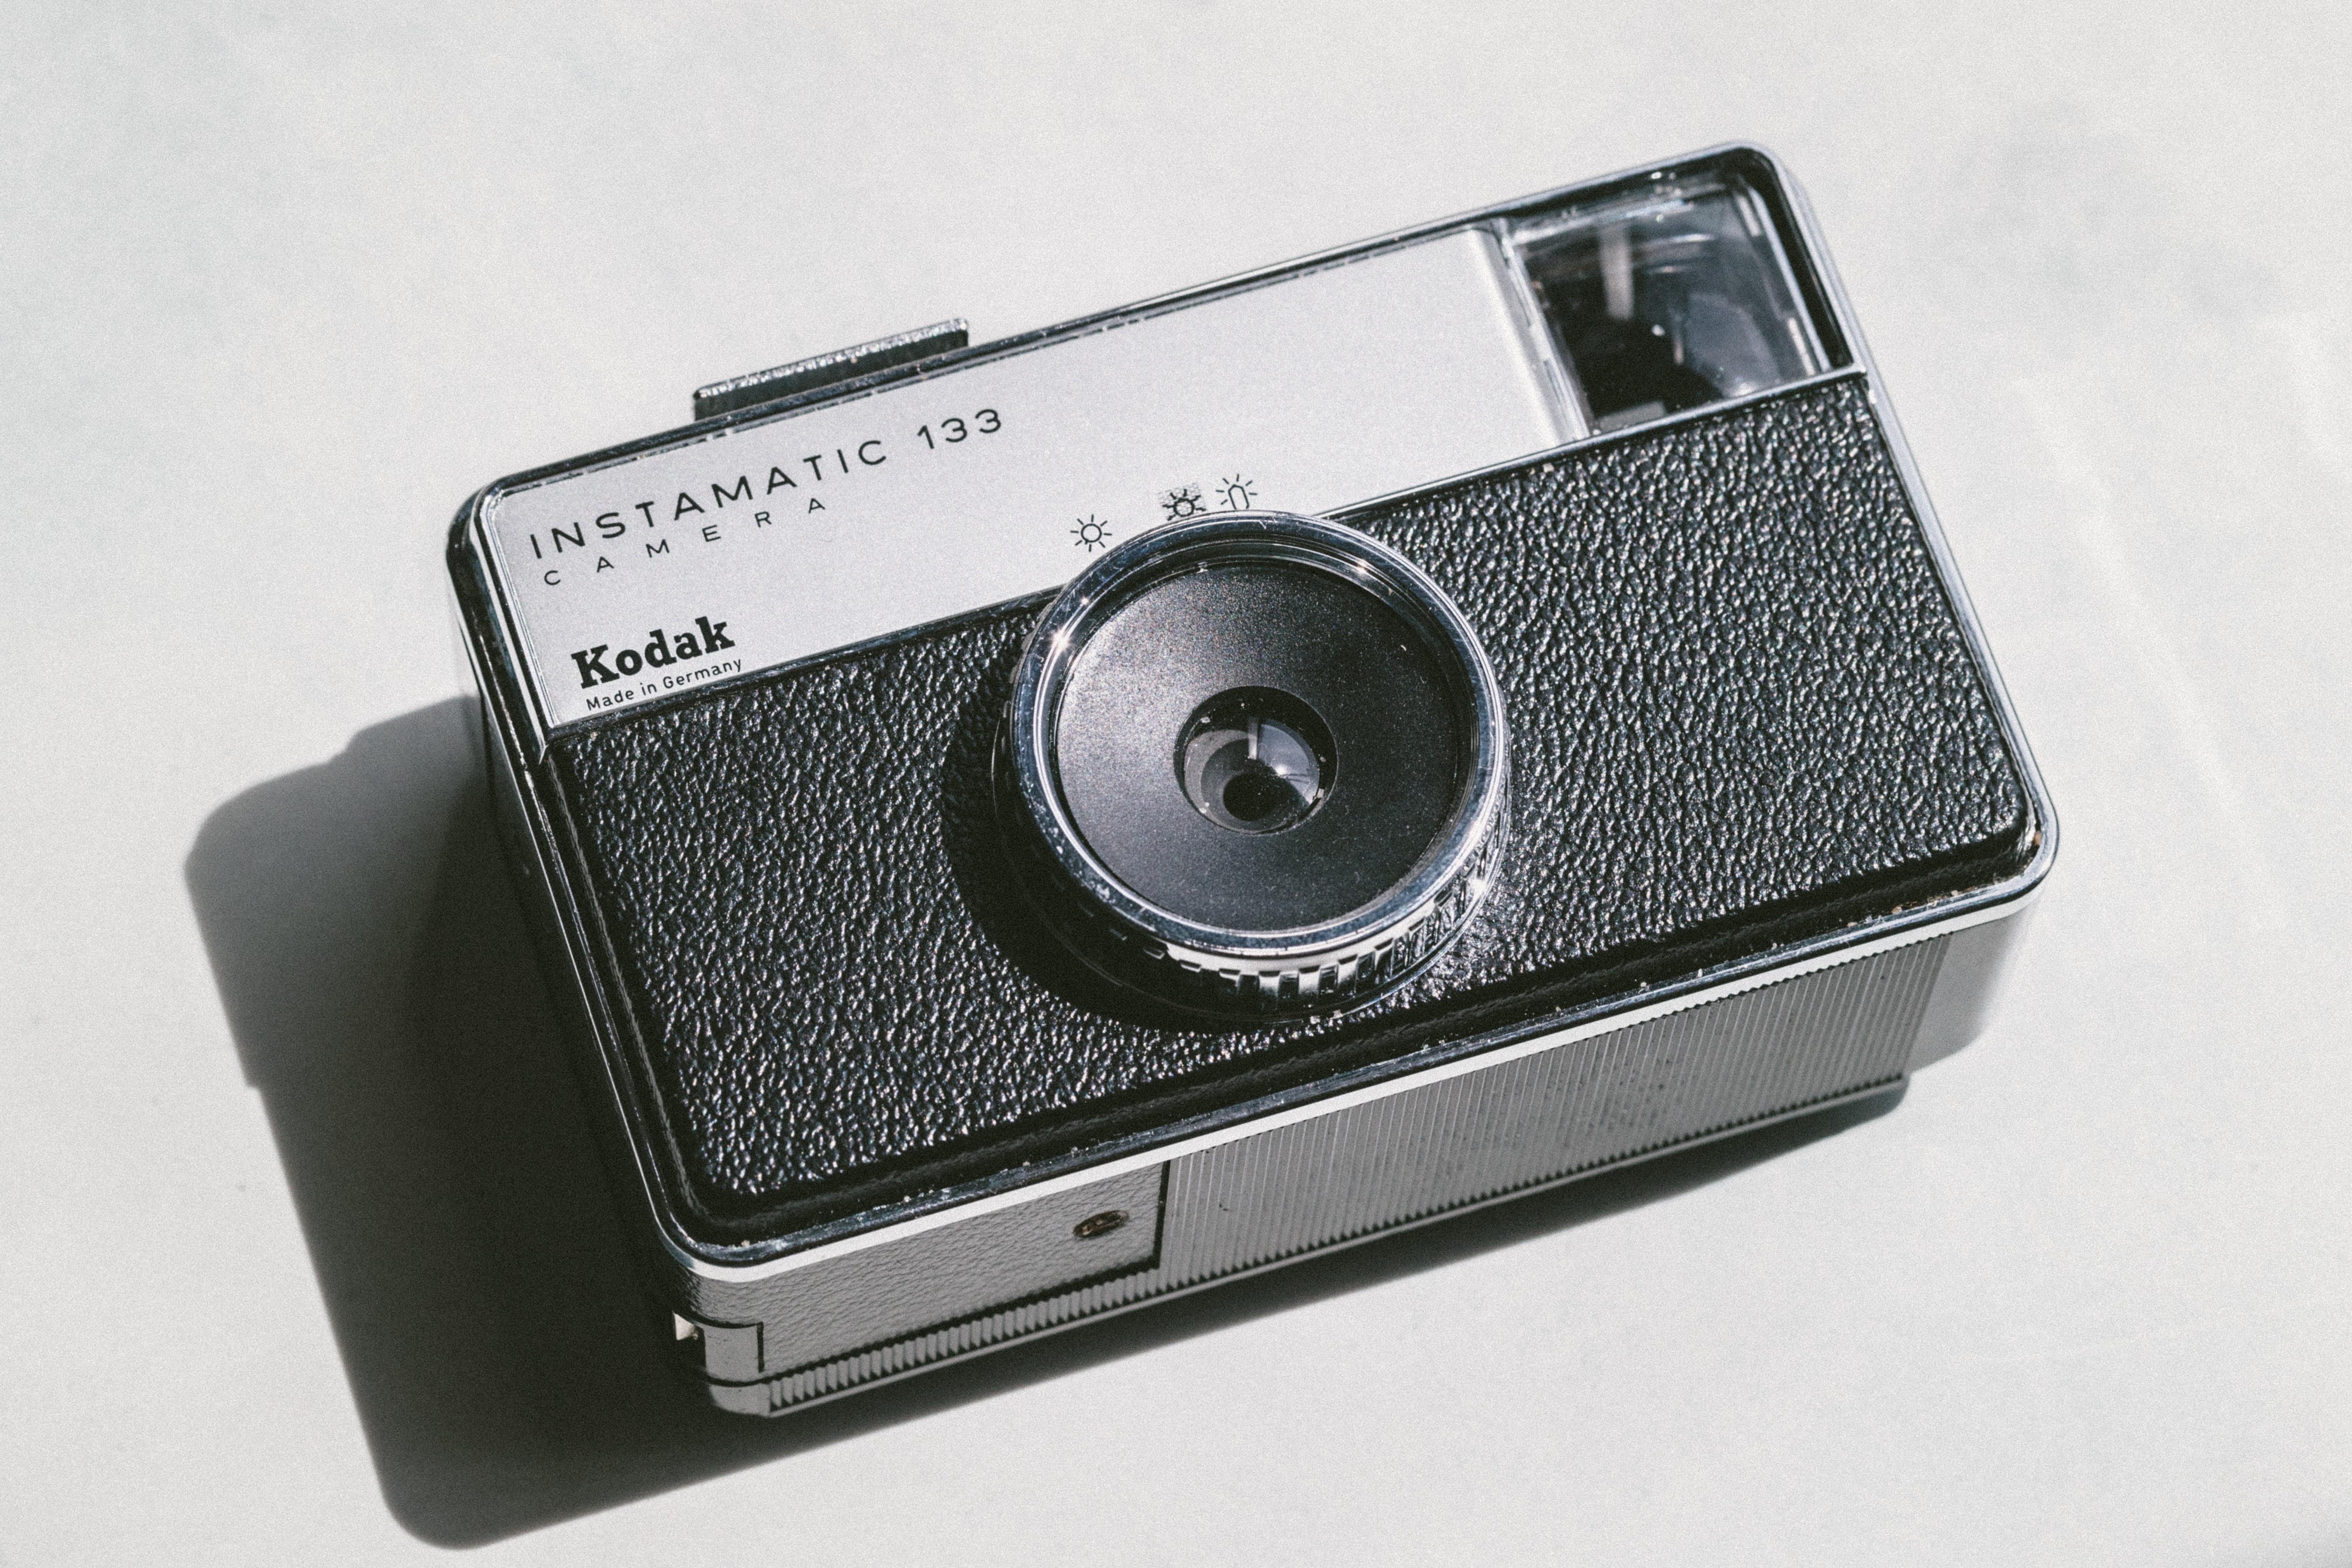 Kodak Instamatic 133 Camera on white surface